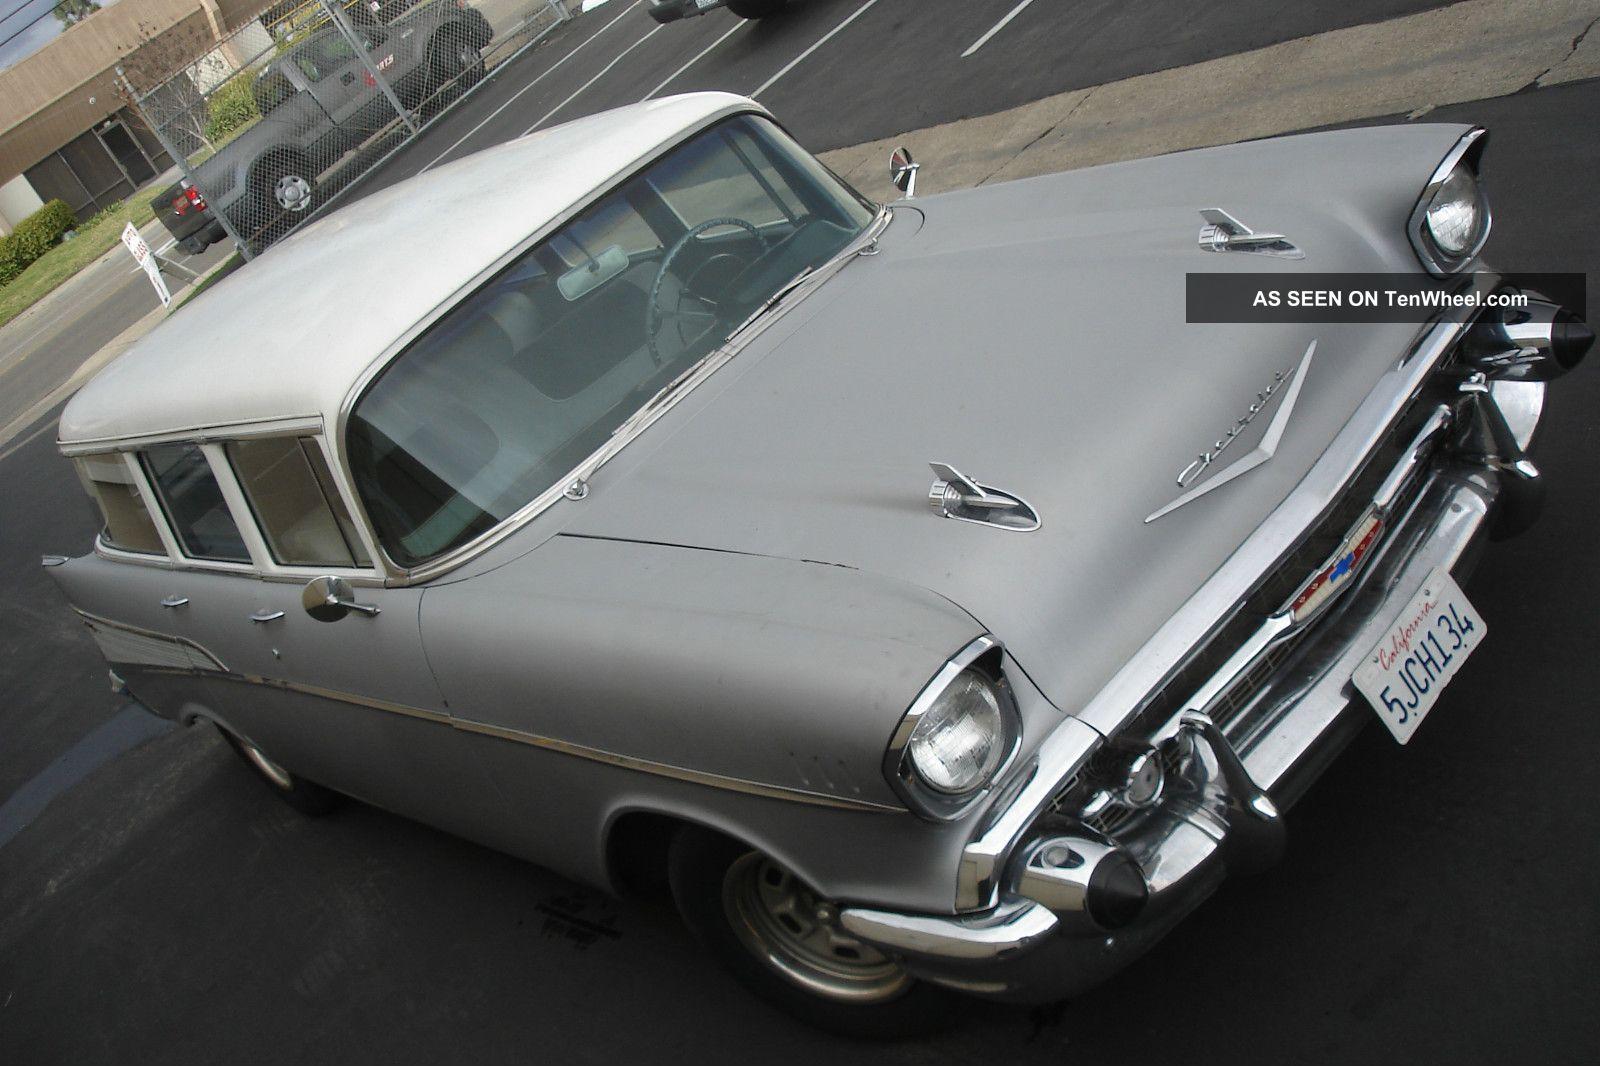 1957 Chevrolet 210 4 Door Station Wagon Straight Driver Bel Air/150/210 photo